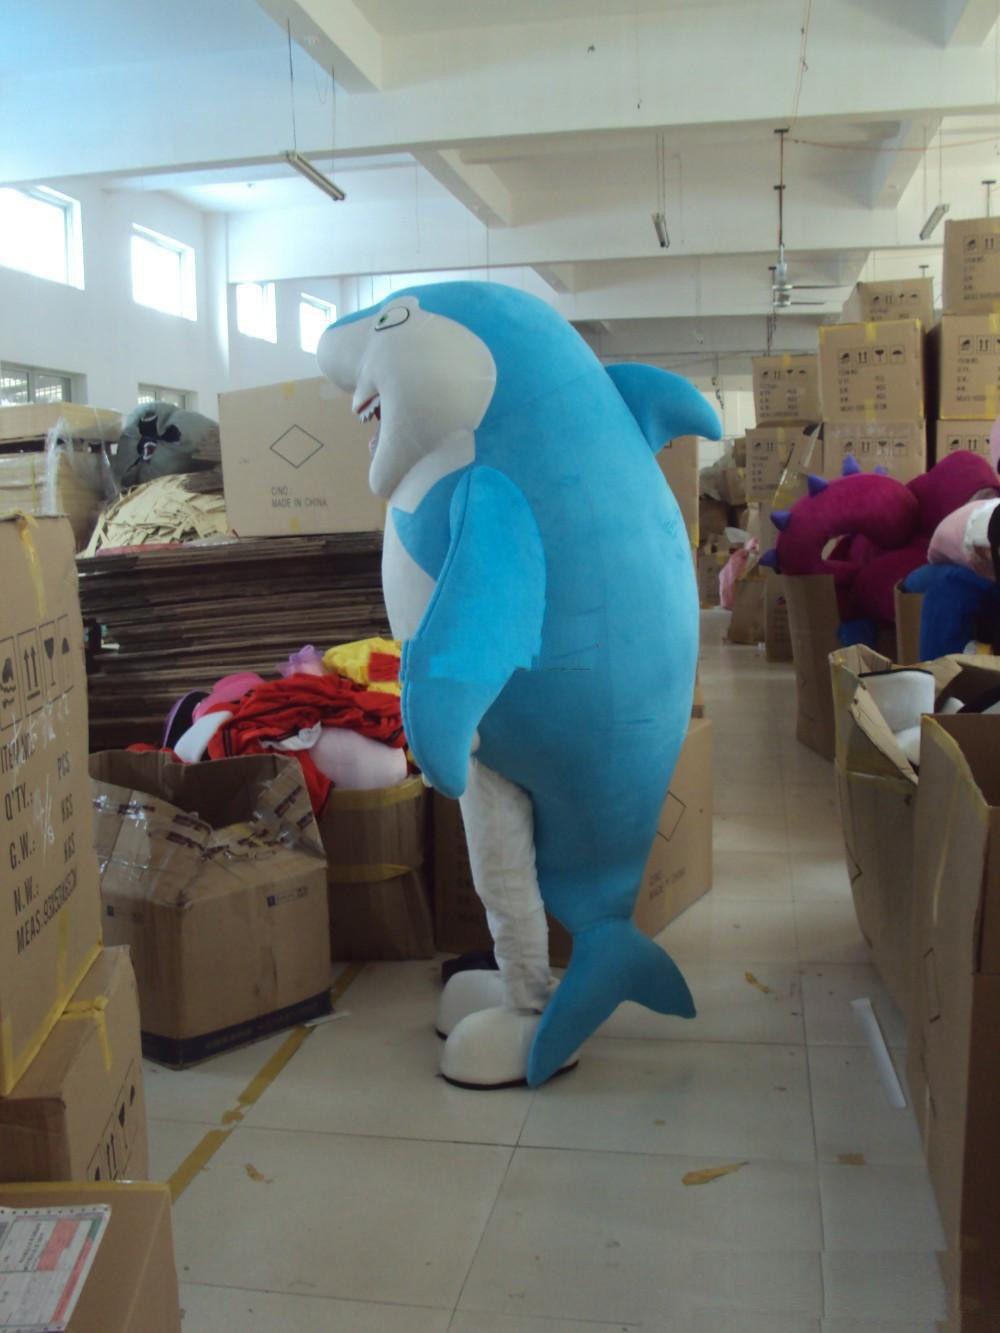 f508f1b3bc 2019 Hot Sale Blue Shark Mascot Costume Adult Character Costume Mascot As  Fashion Lancer Mascot Costume Plush Mascot Costumes From Appliquedmermaid,  ...